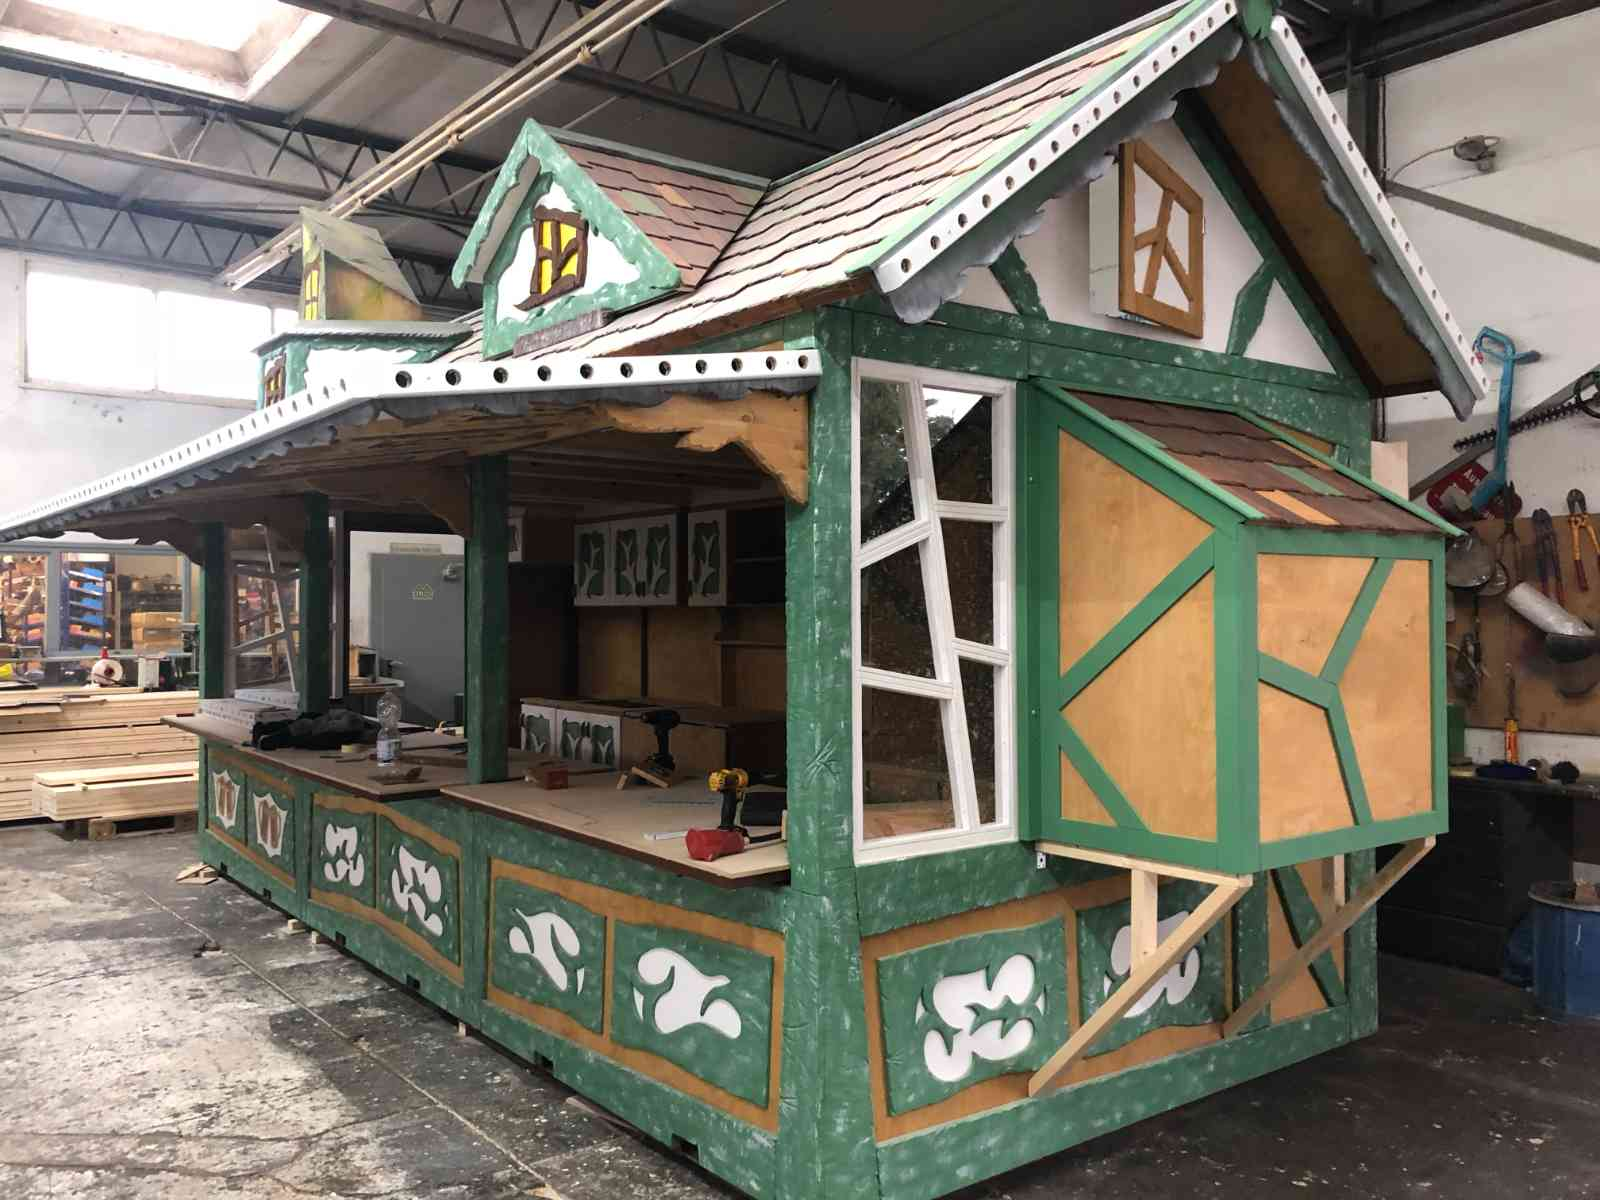 046-Hütte Rustikal